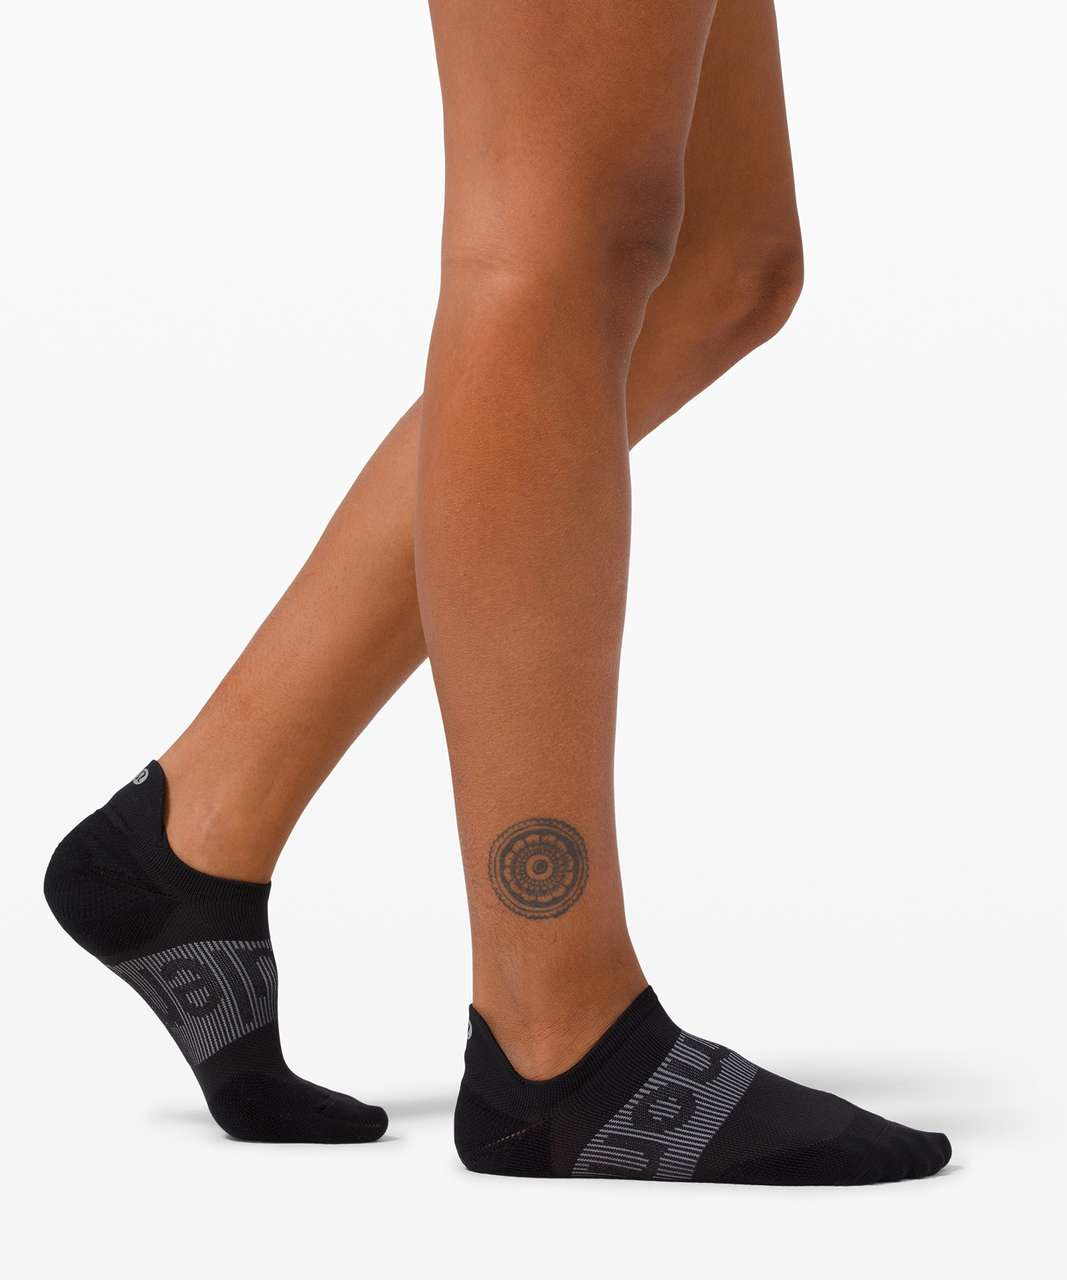 Lululemon Power Stride Tab Sock *3 Pack - Black